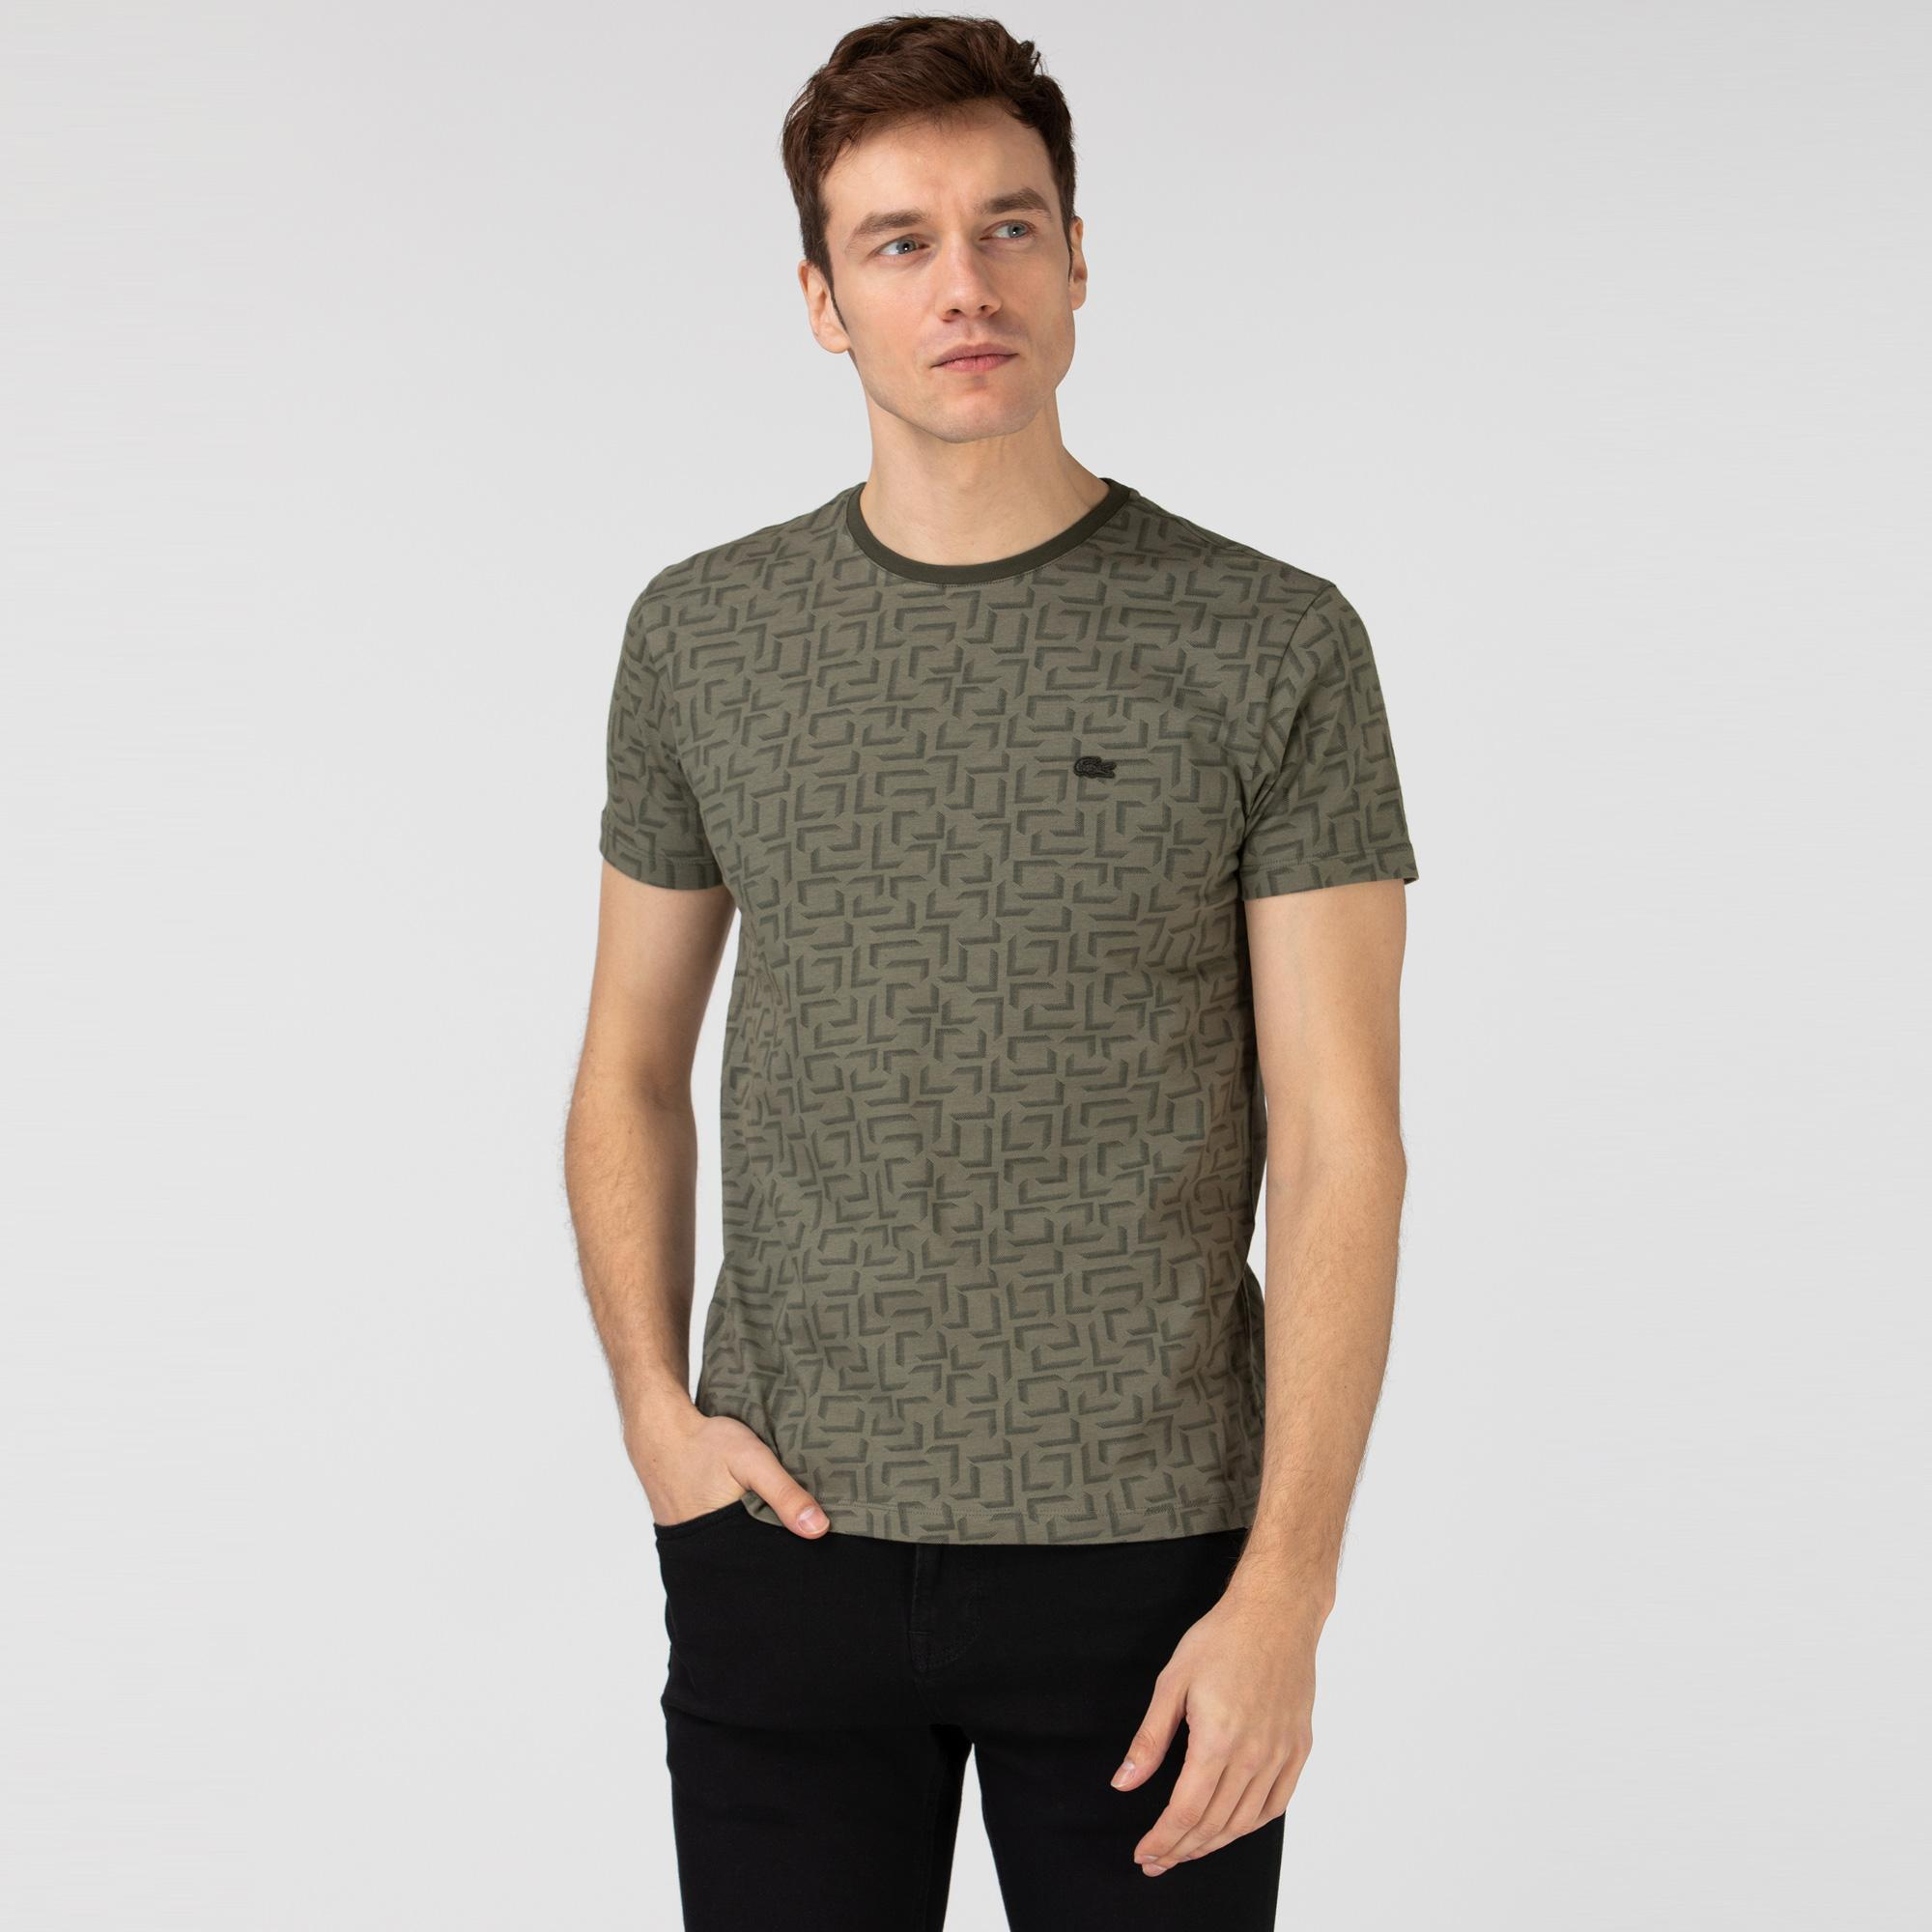 Lacoste Erkek Slim Fit Bisiklet Yaka Desenli Haki T-Shirt